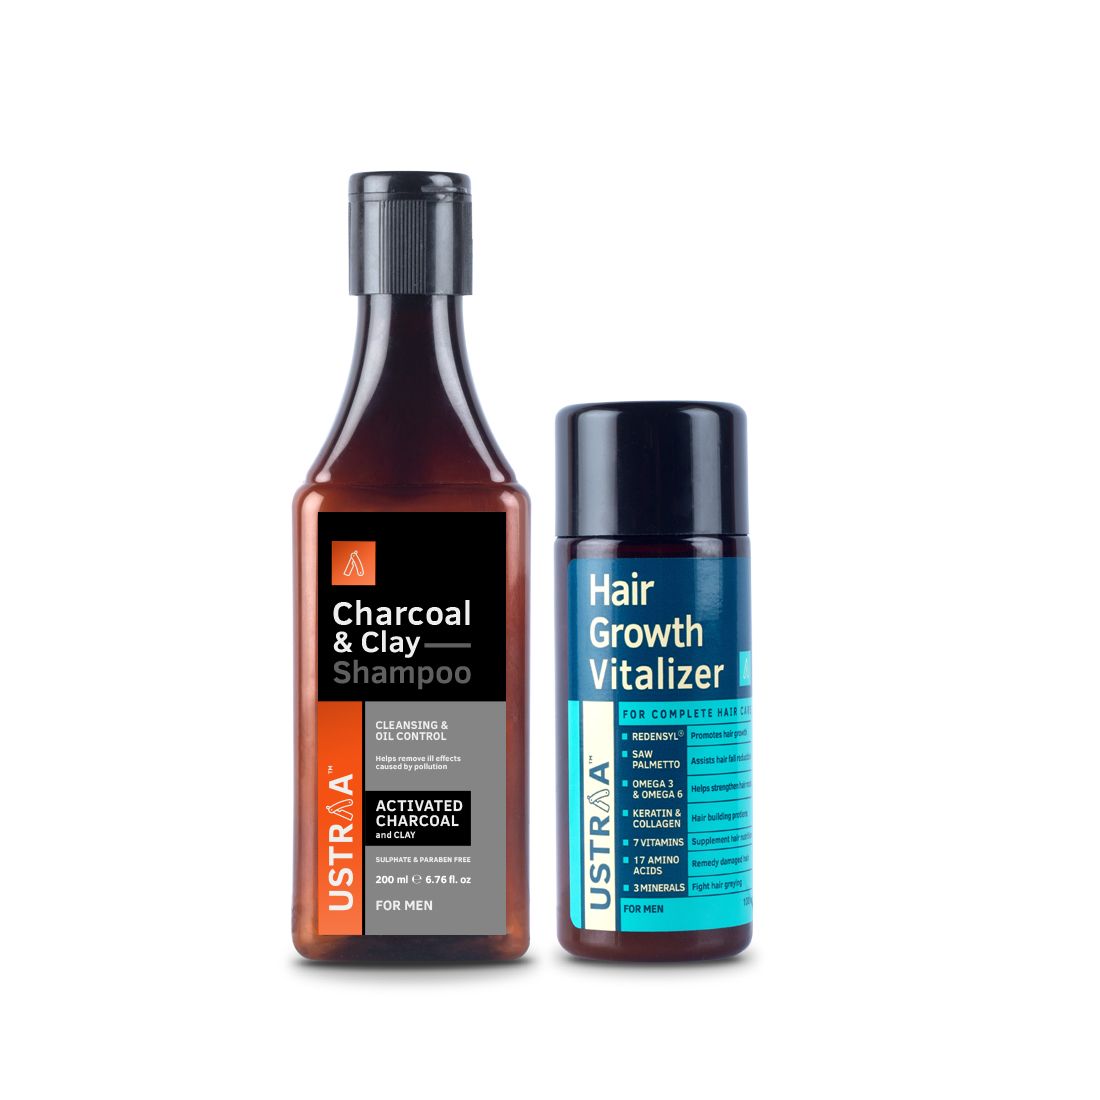 Clay & Charcoal Shampoo & Hair Growth Vitalizer